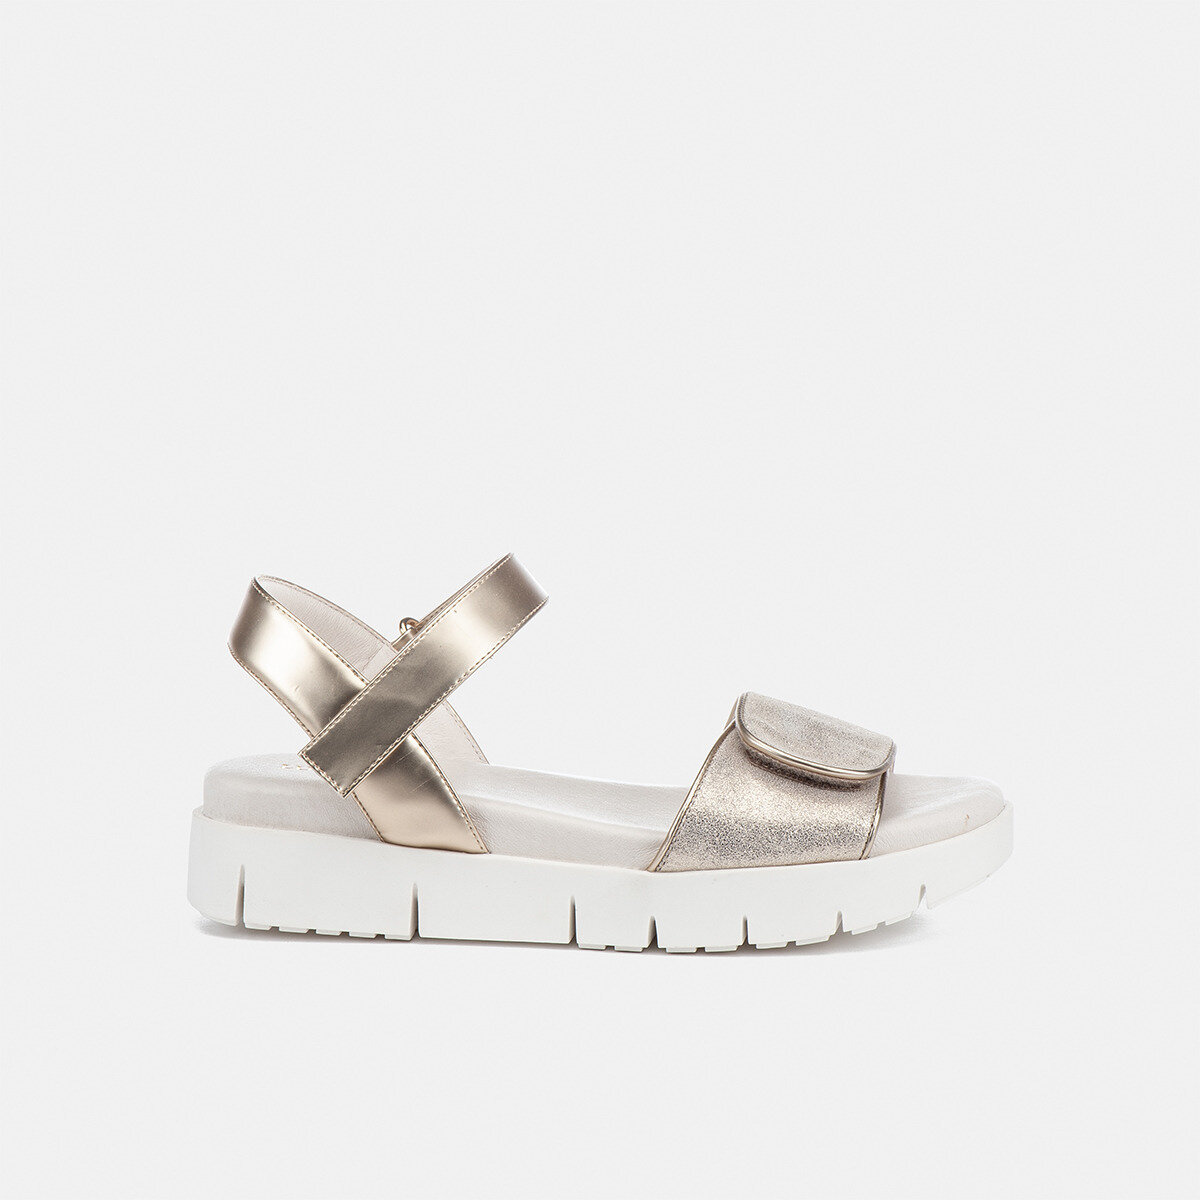 EVETTE PLATINO Woman Sandals